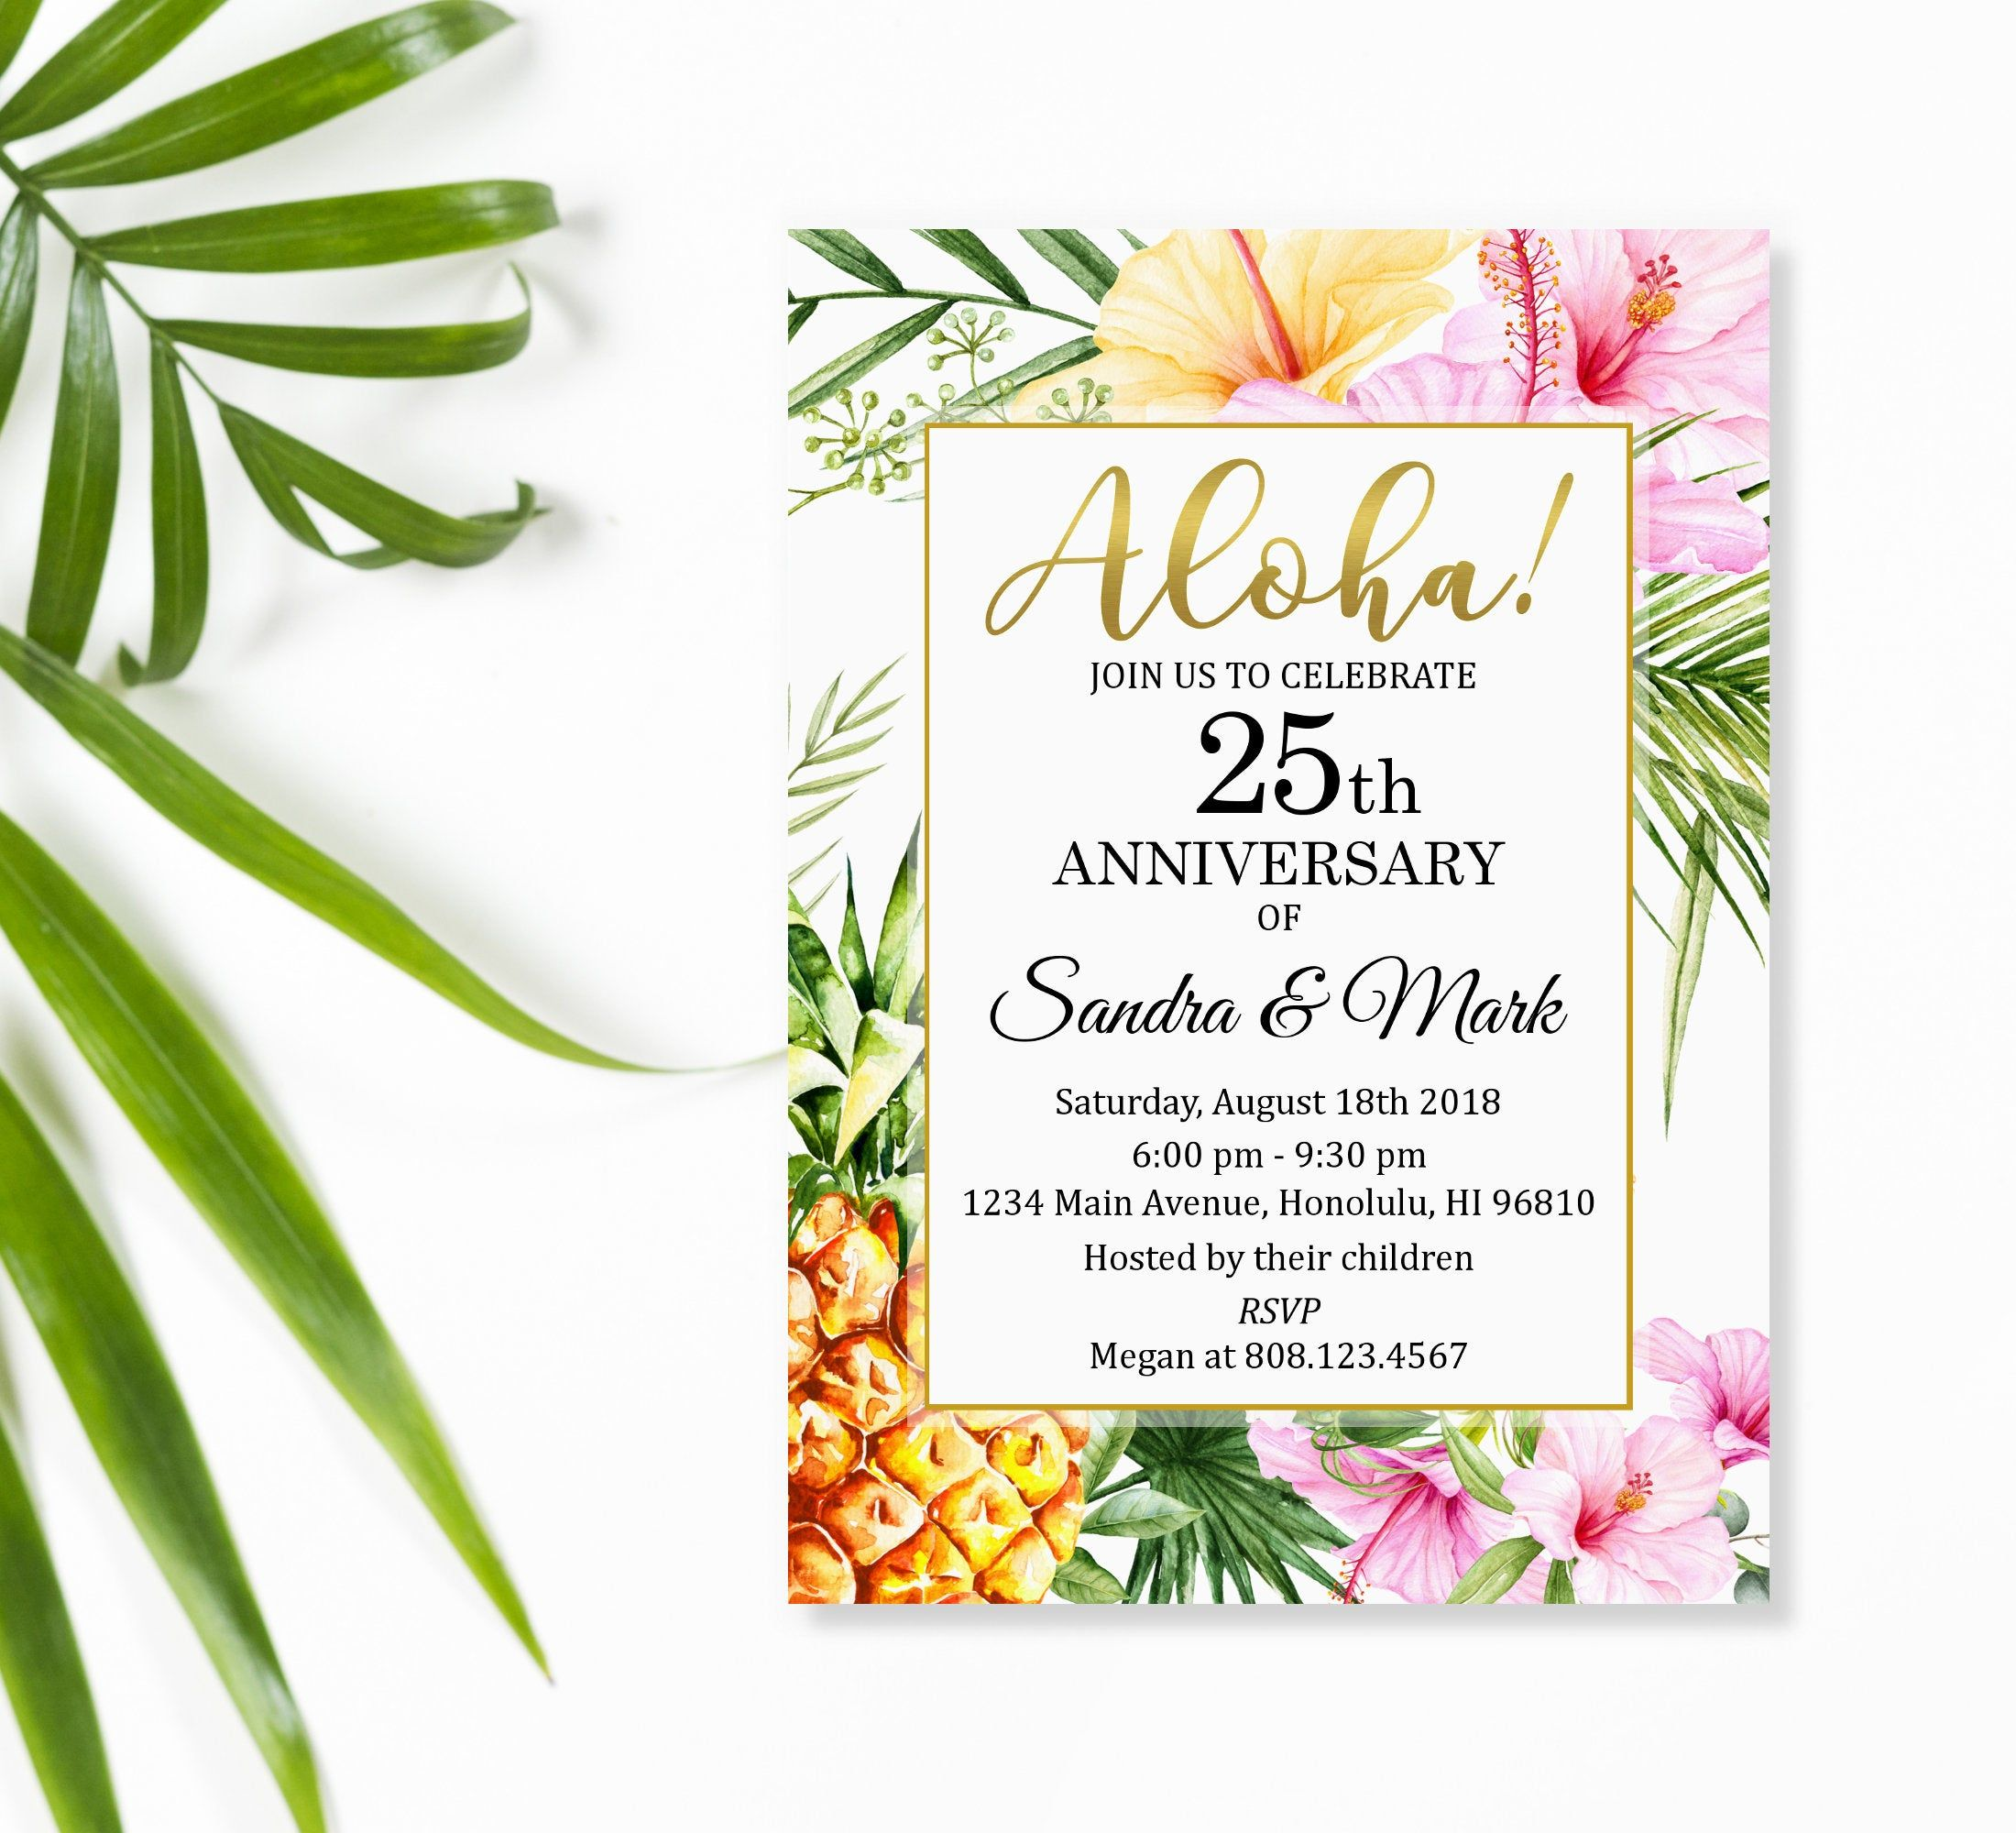 Any year hawaiian luau wedding anniversary invitation